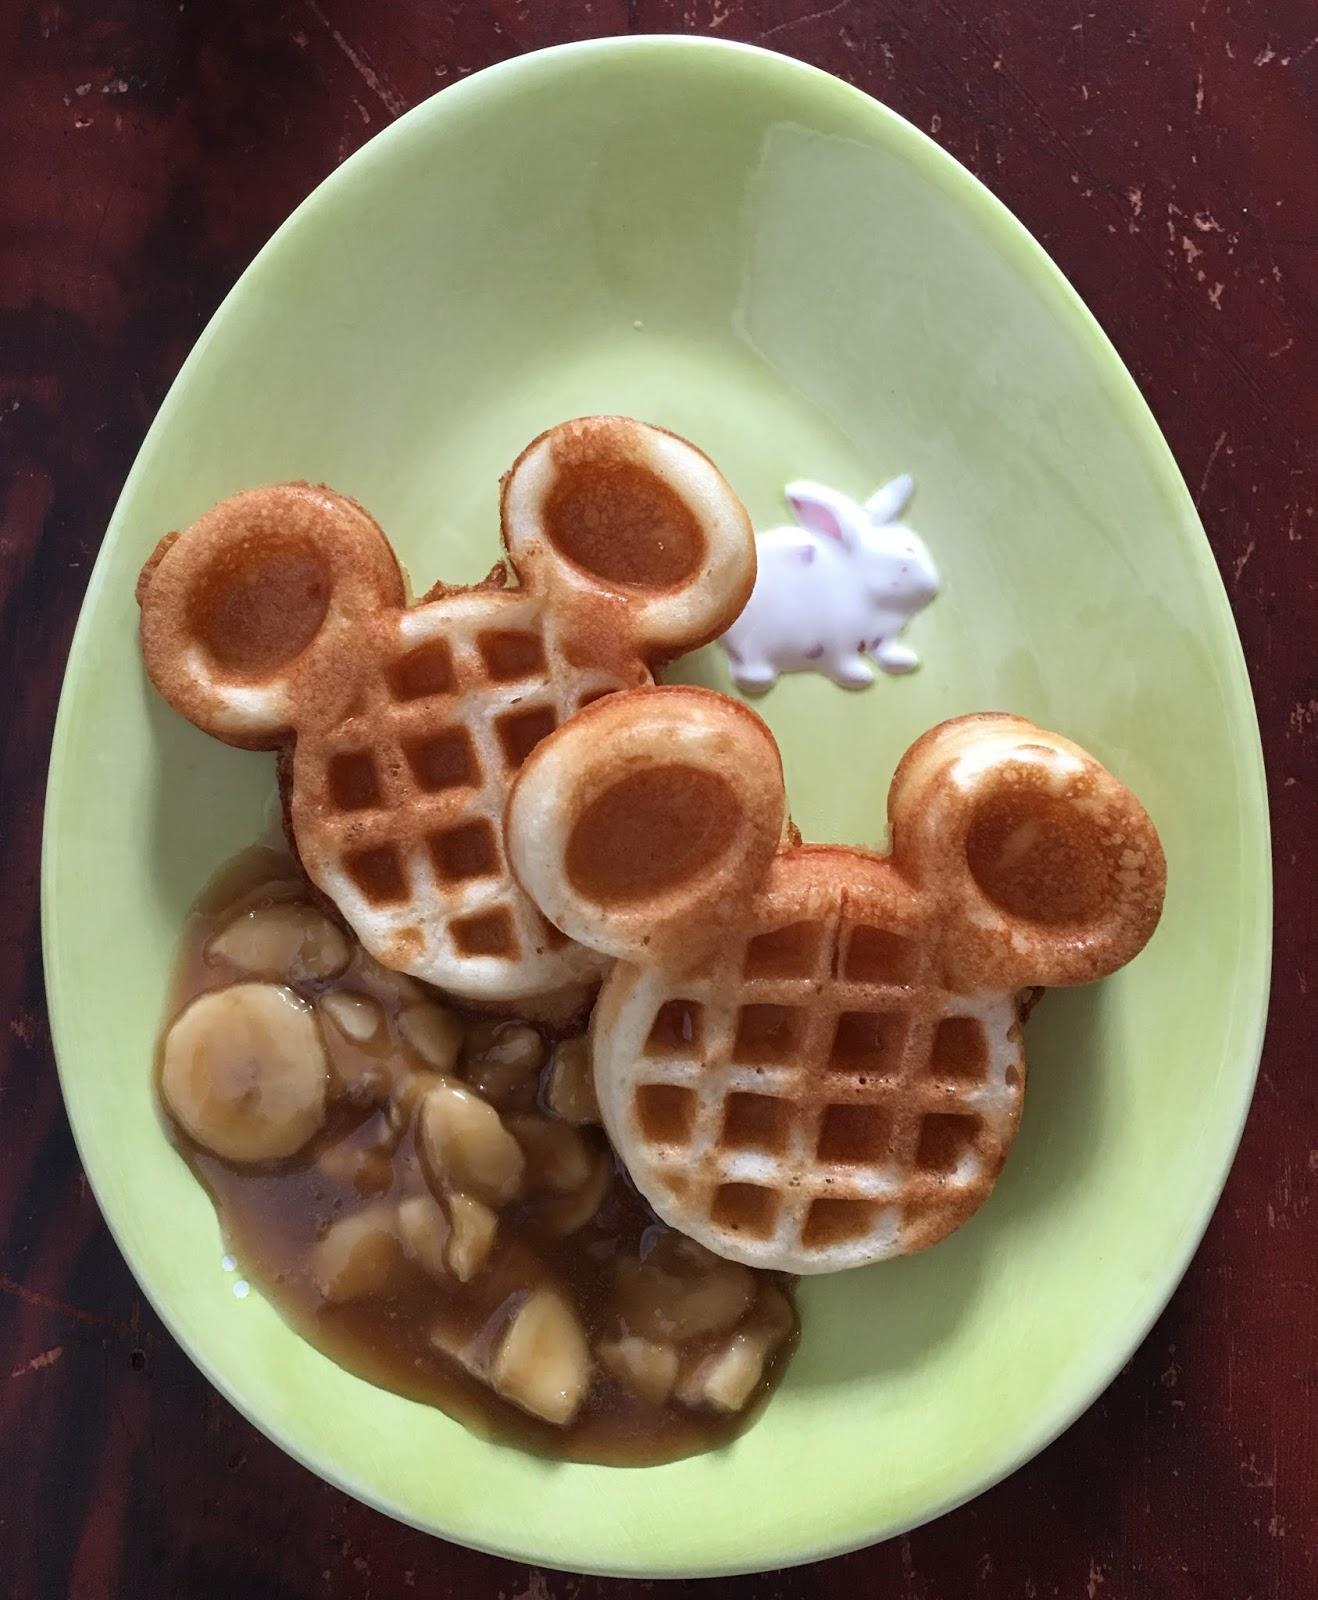 bellegem waffle mix instructions